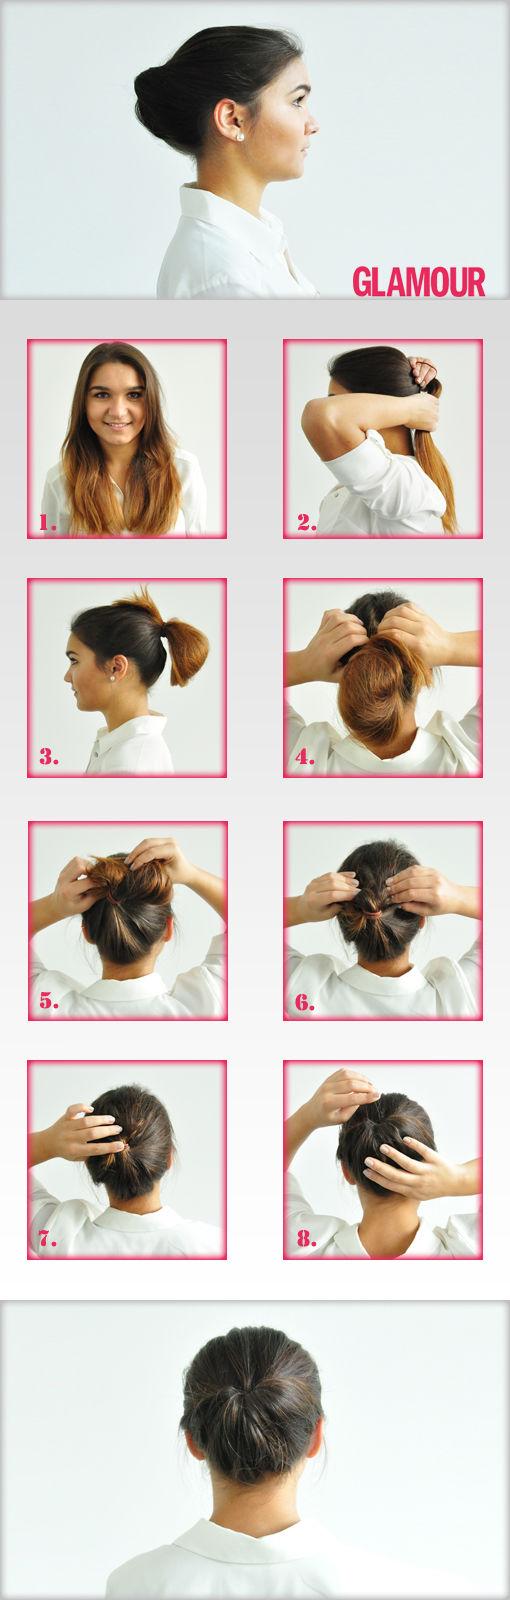 Frisuren Zum Selbermachen Business Knoten Business Frisuren Stilvolle Frisuren Frisuren Zum Selbermachen